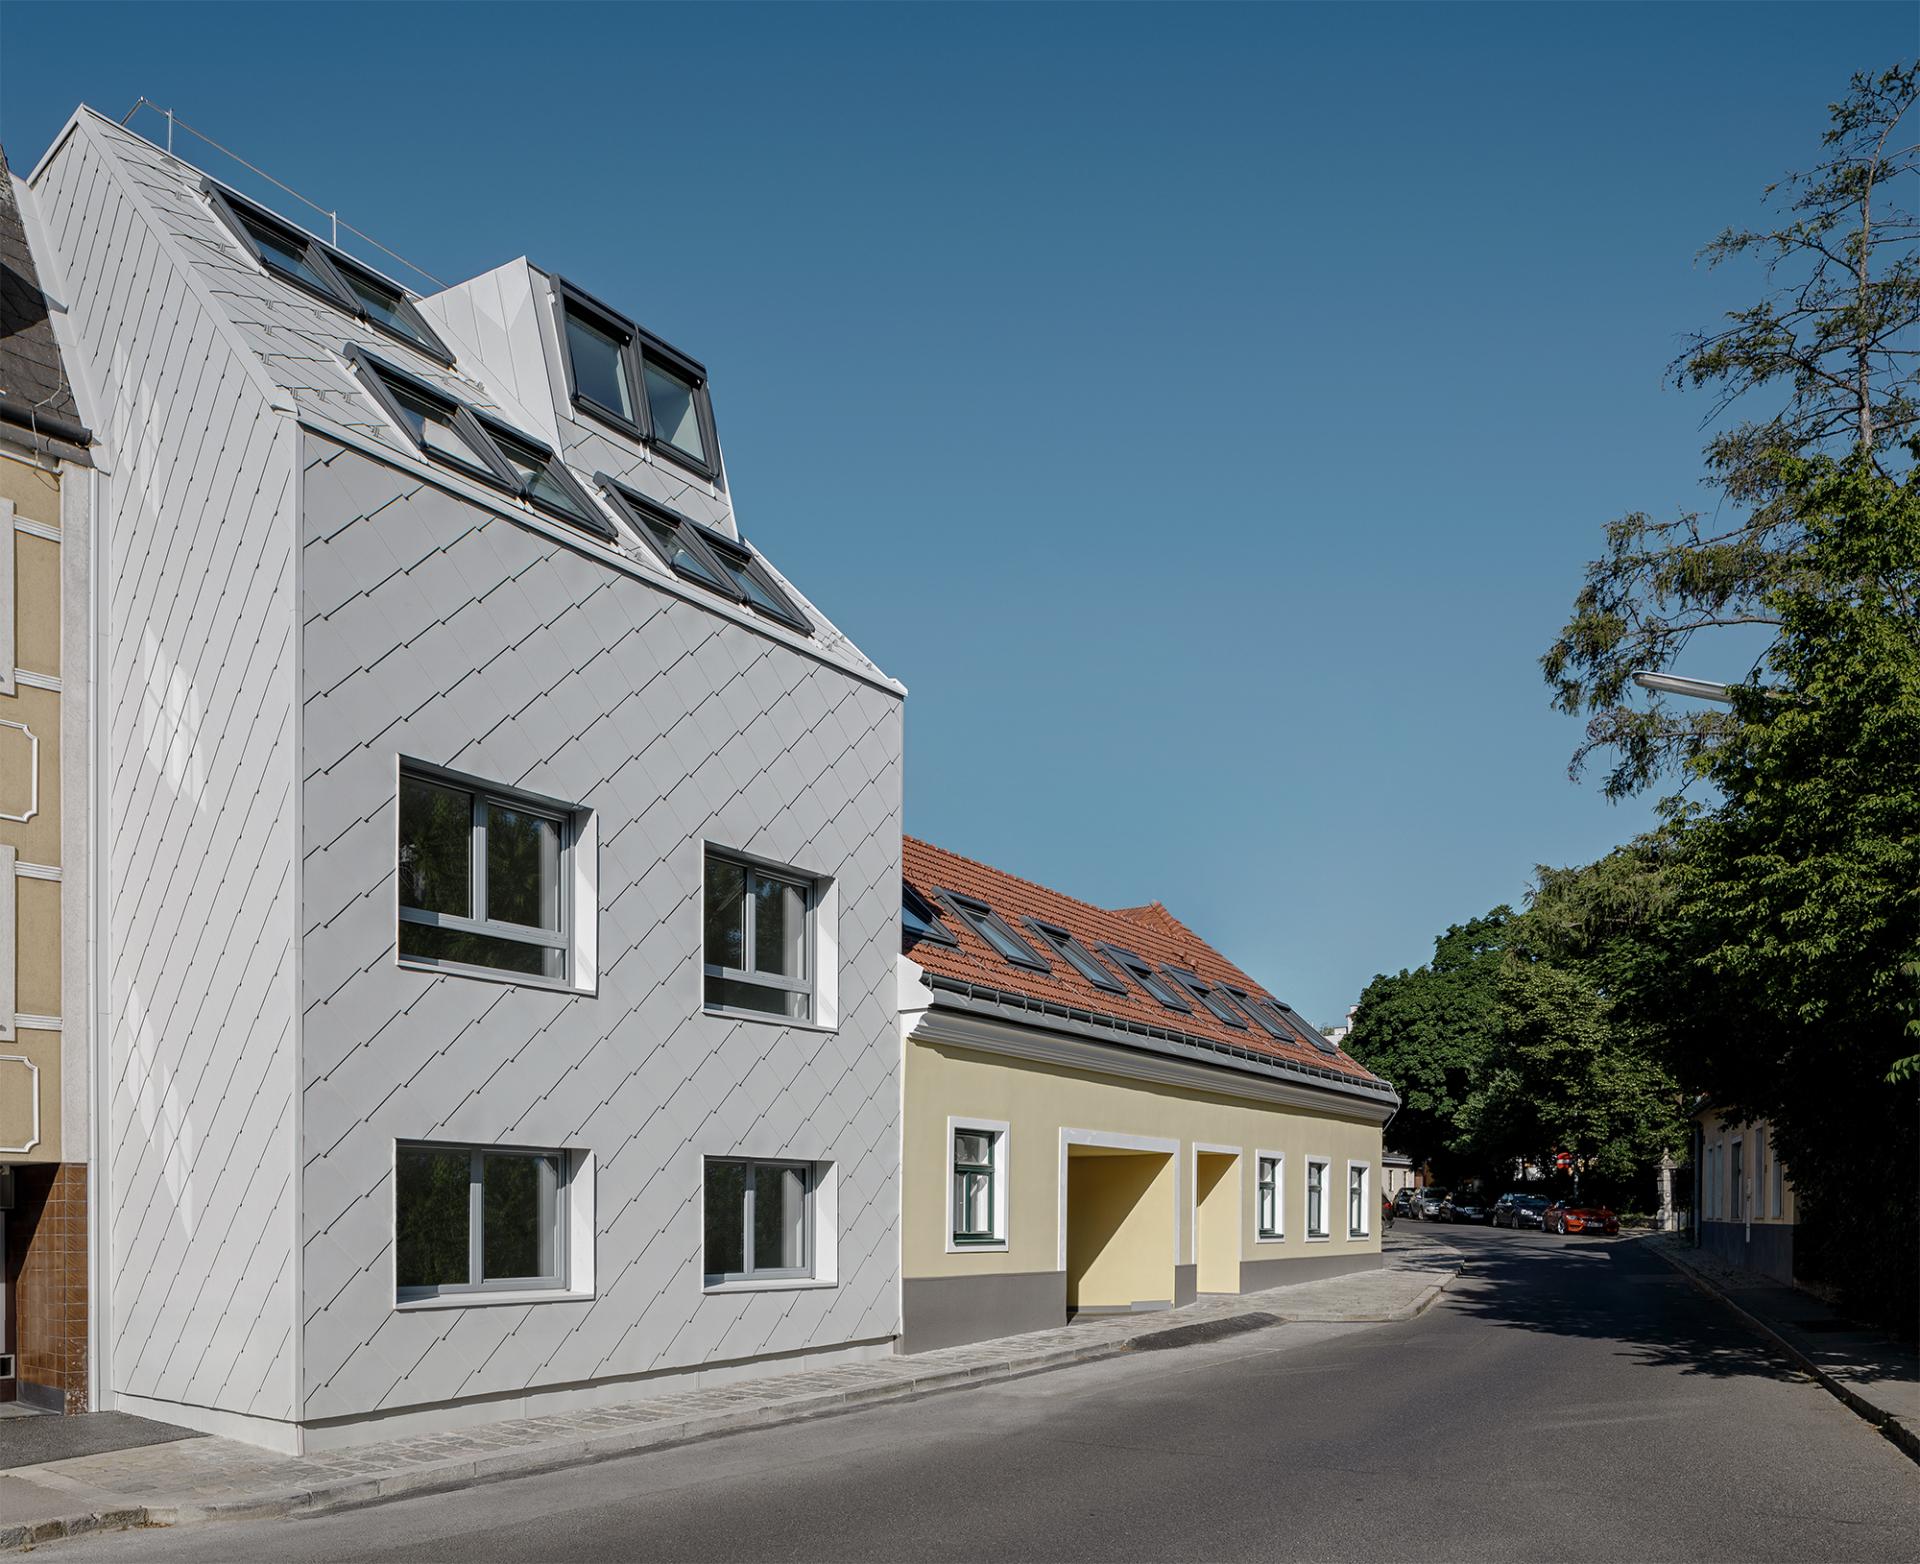 MAXIMILIAN HAIDACHER / PHOTOGRAPHY Dobl Sievering, Wien